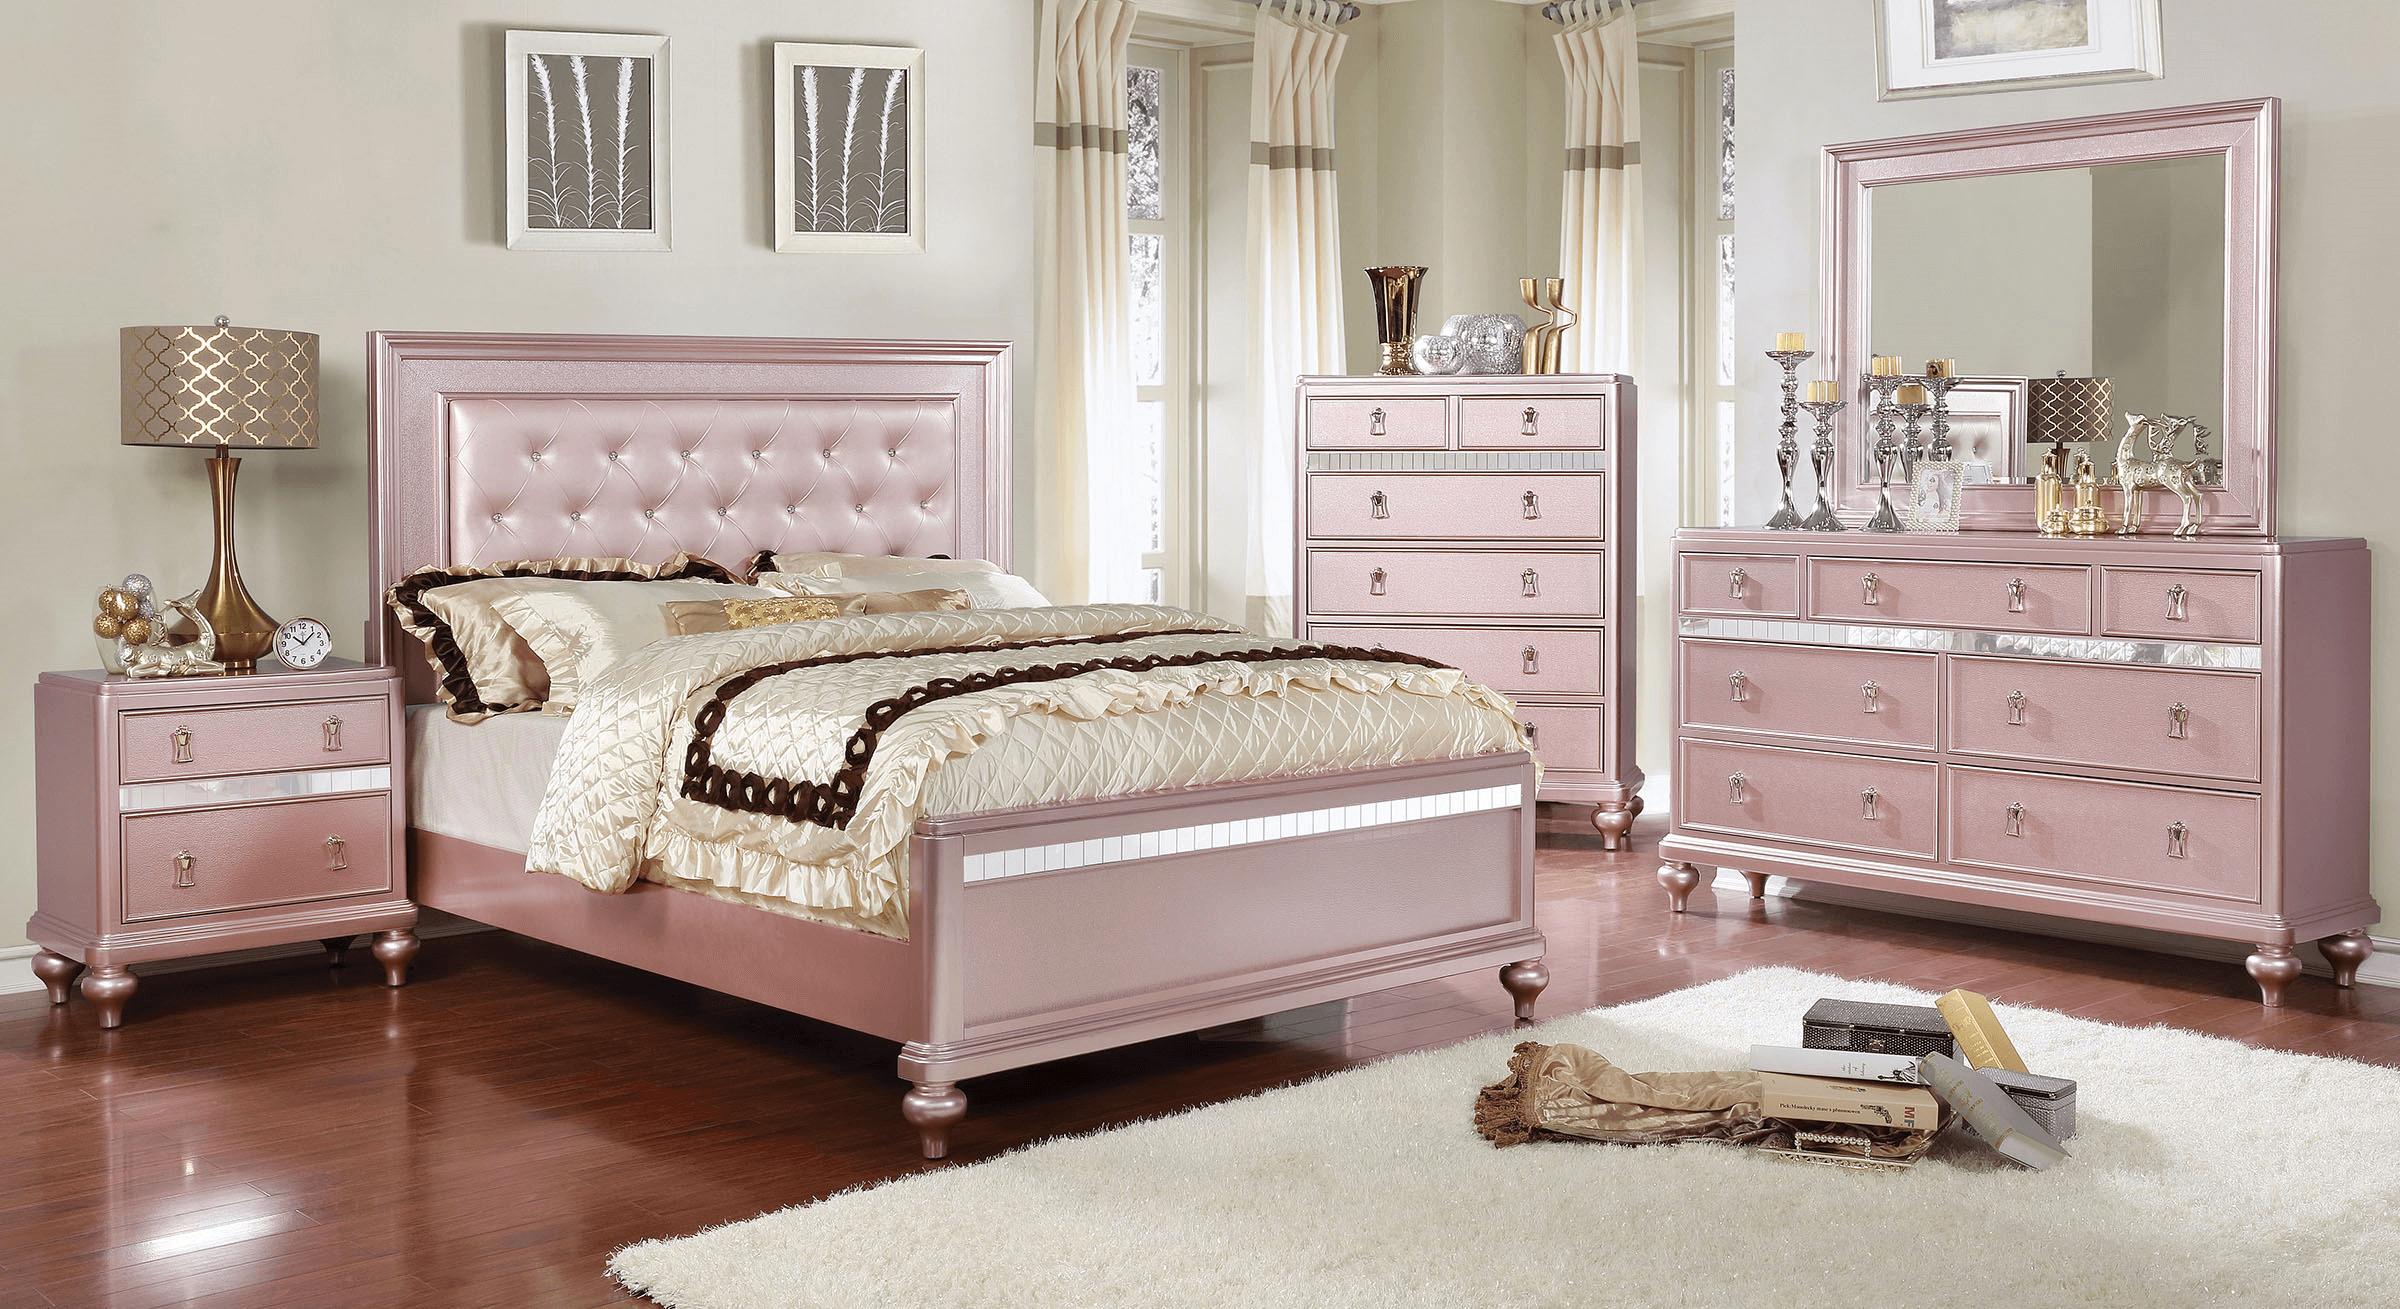 Ariston Rose Gold Bedroom Set Rose Gold Bedroom Gold Bedroom Bedroom Sets